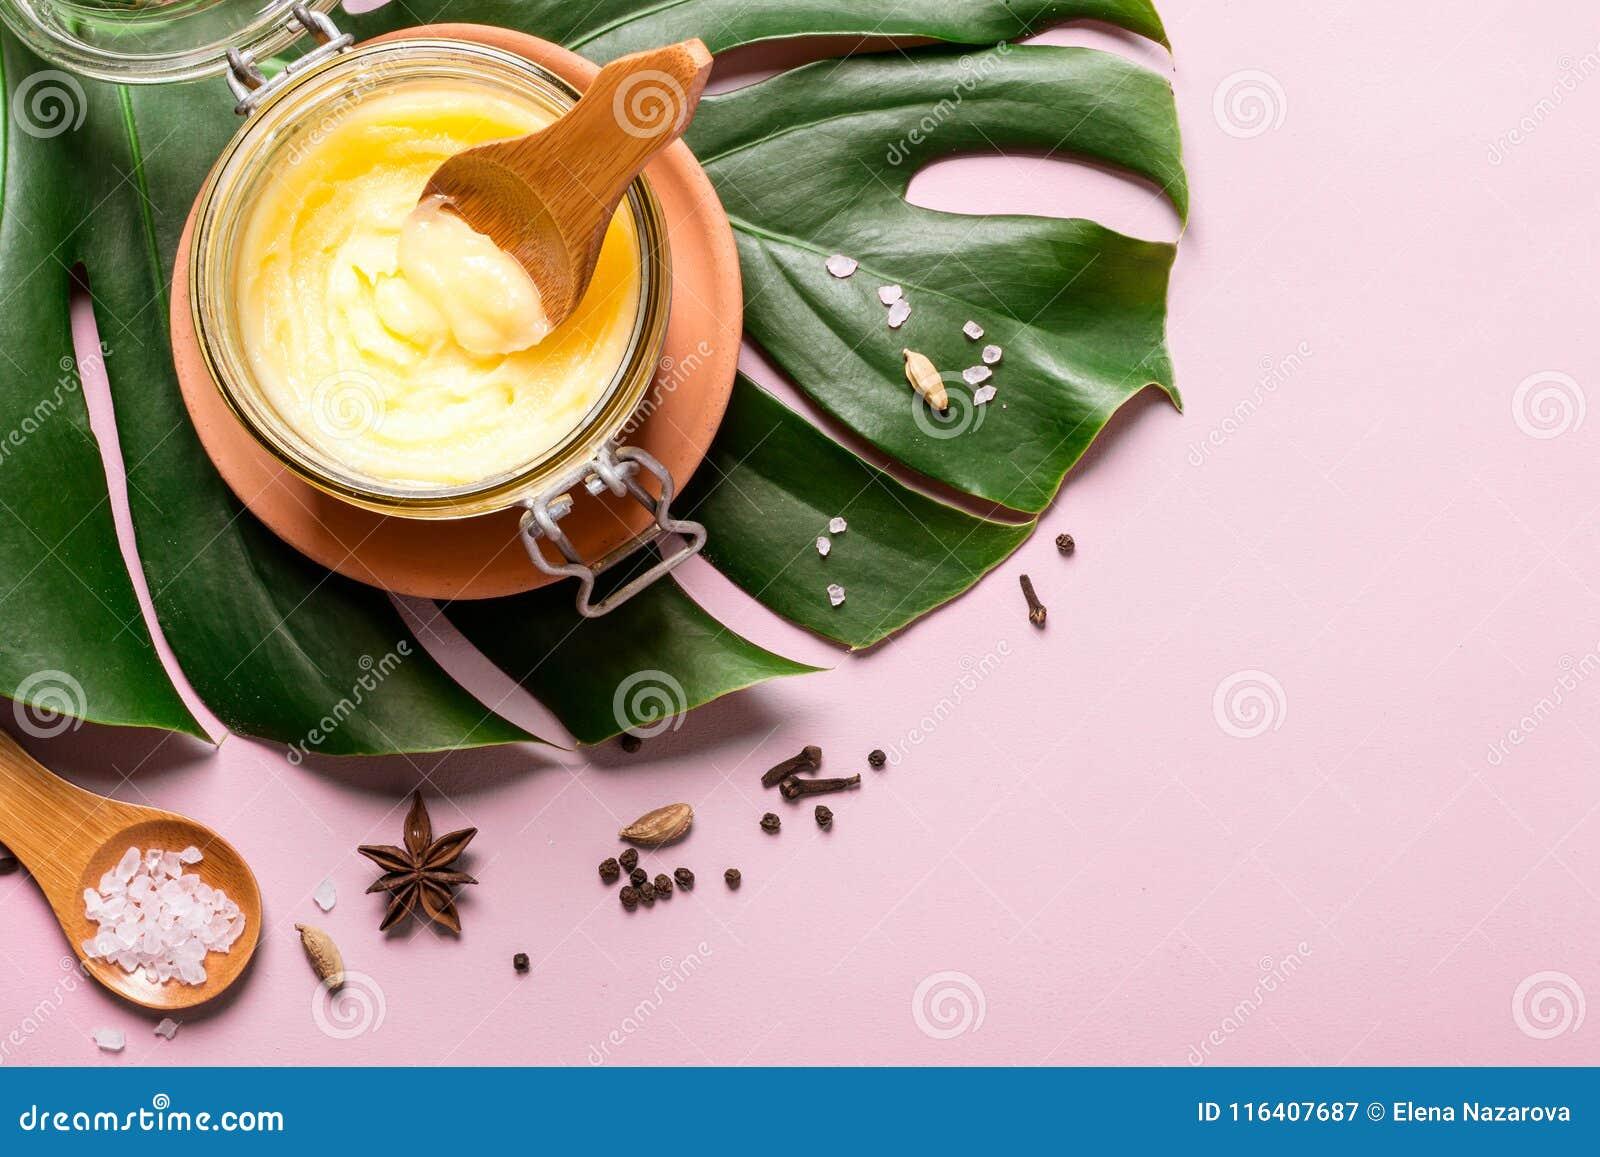 Ghee βούτυρο σε ένα βάζο γυαλιού, ένα ρόδινα άλας και καρυκεύματα στο ρόδινο υπόβαθρο